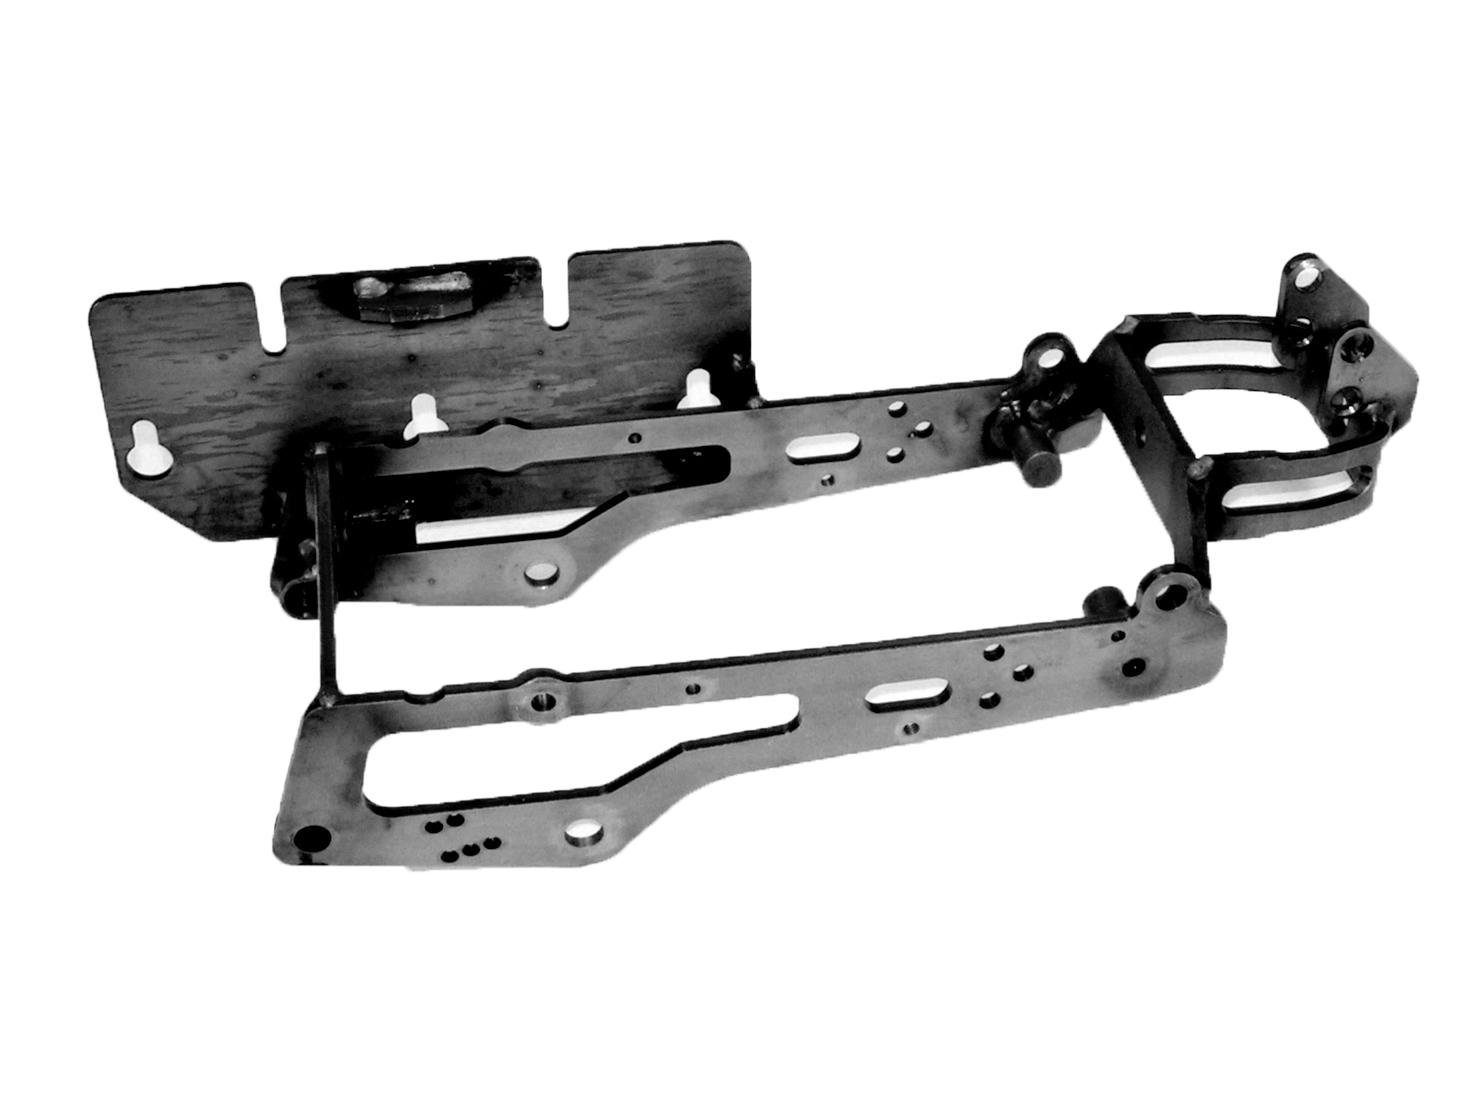 MK93 Cradle